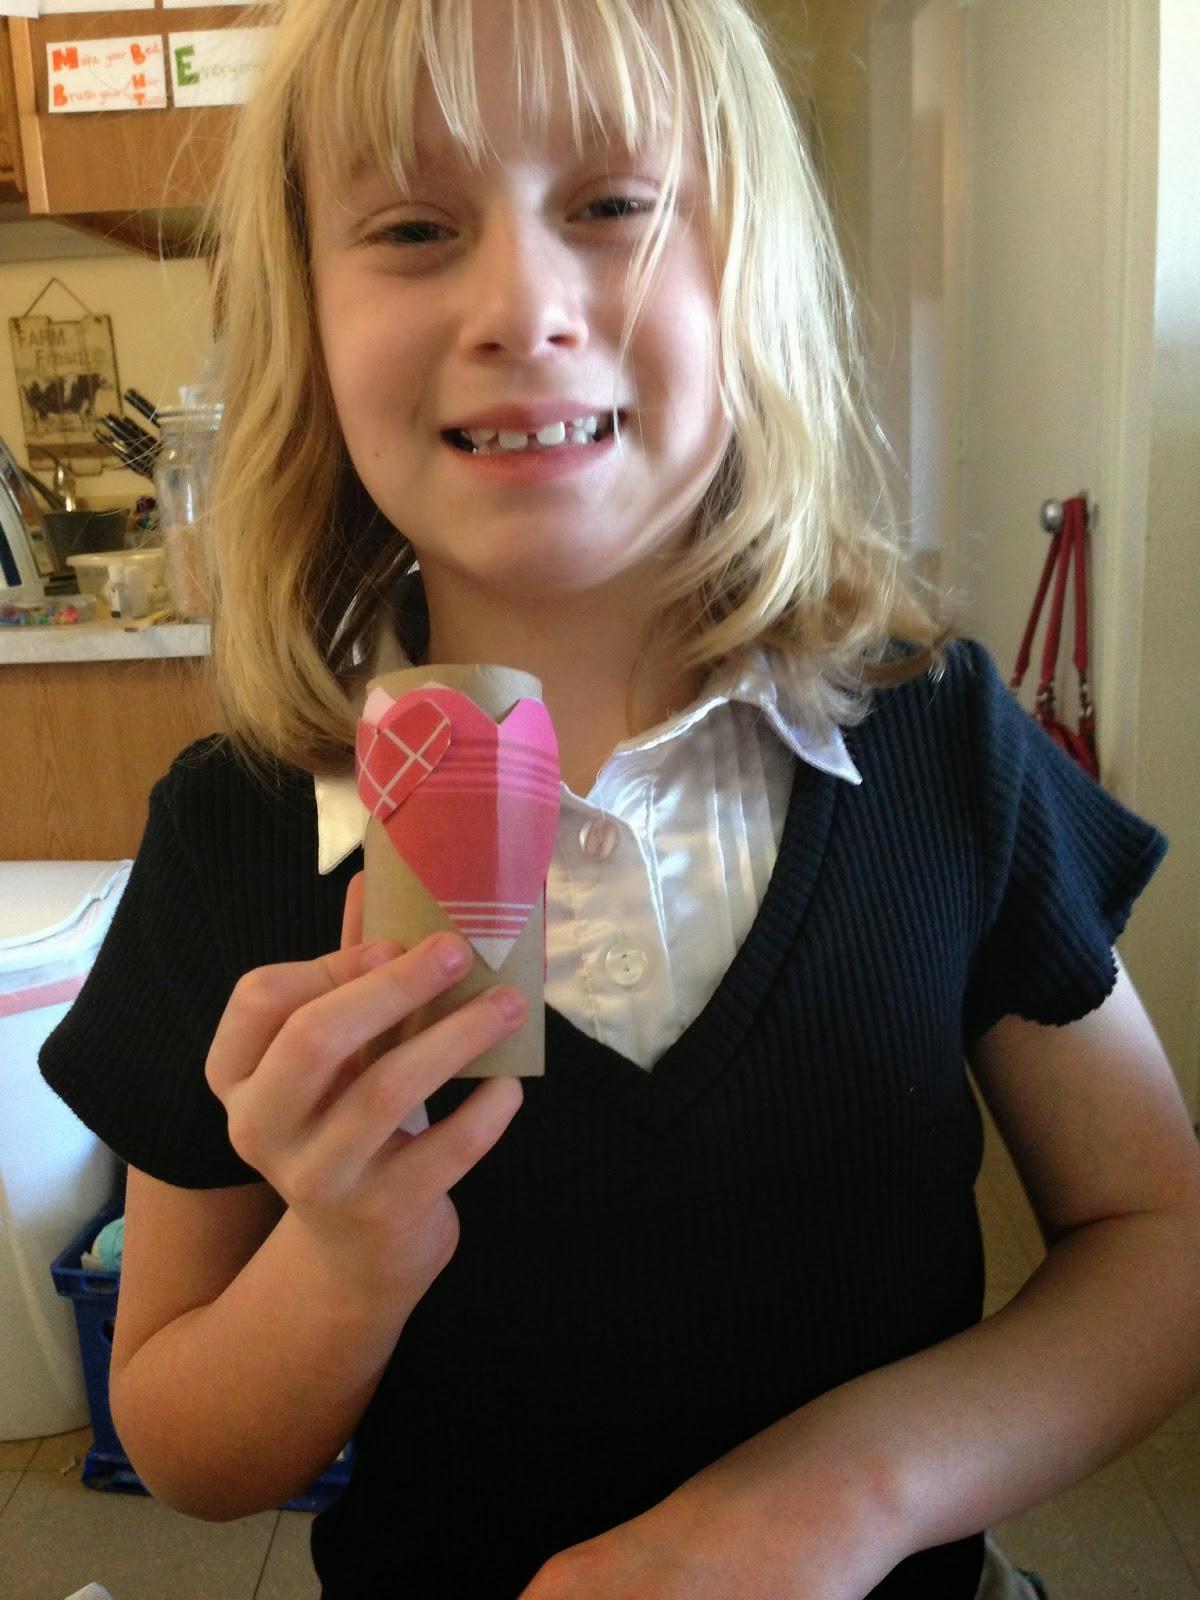 making a valentines craft